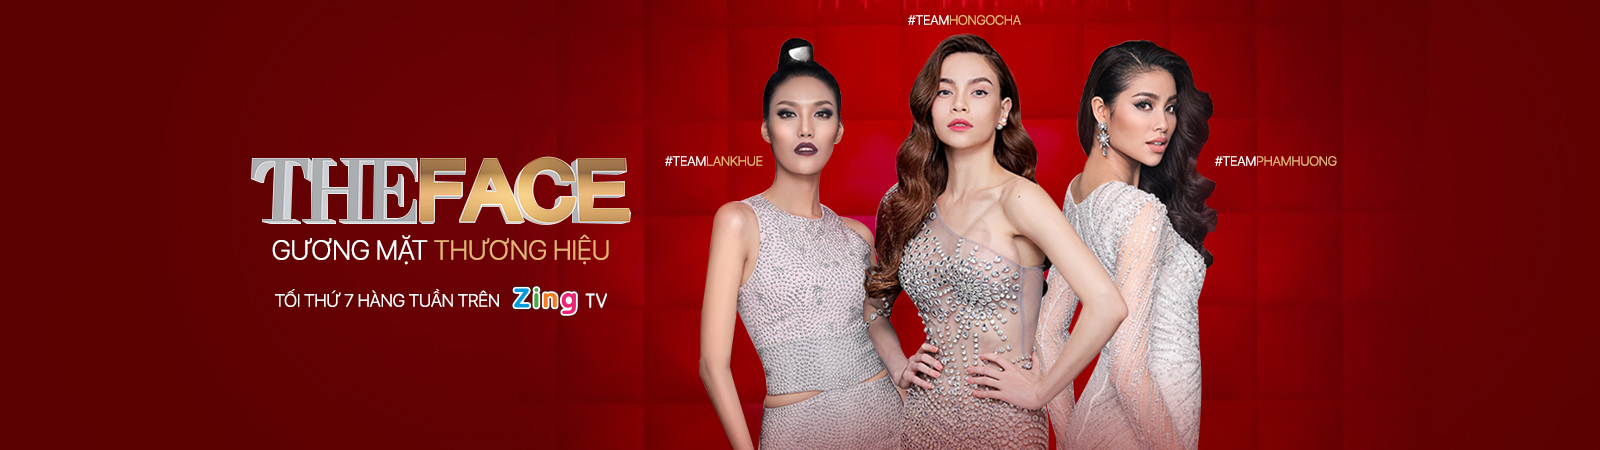 The Face Vietnam 2016 - Gương Mặt Thương Hiệu 2016